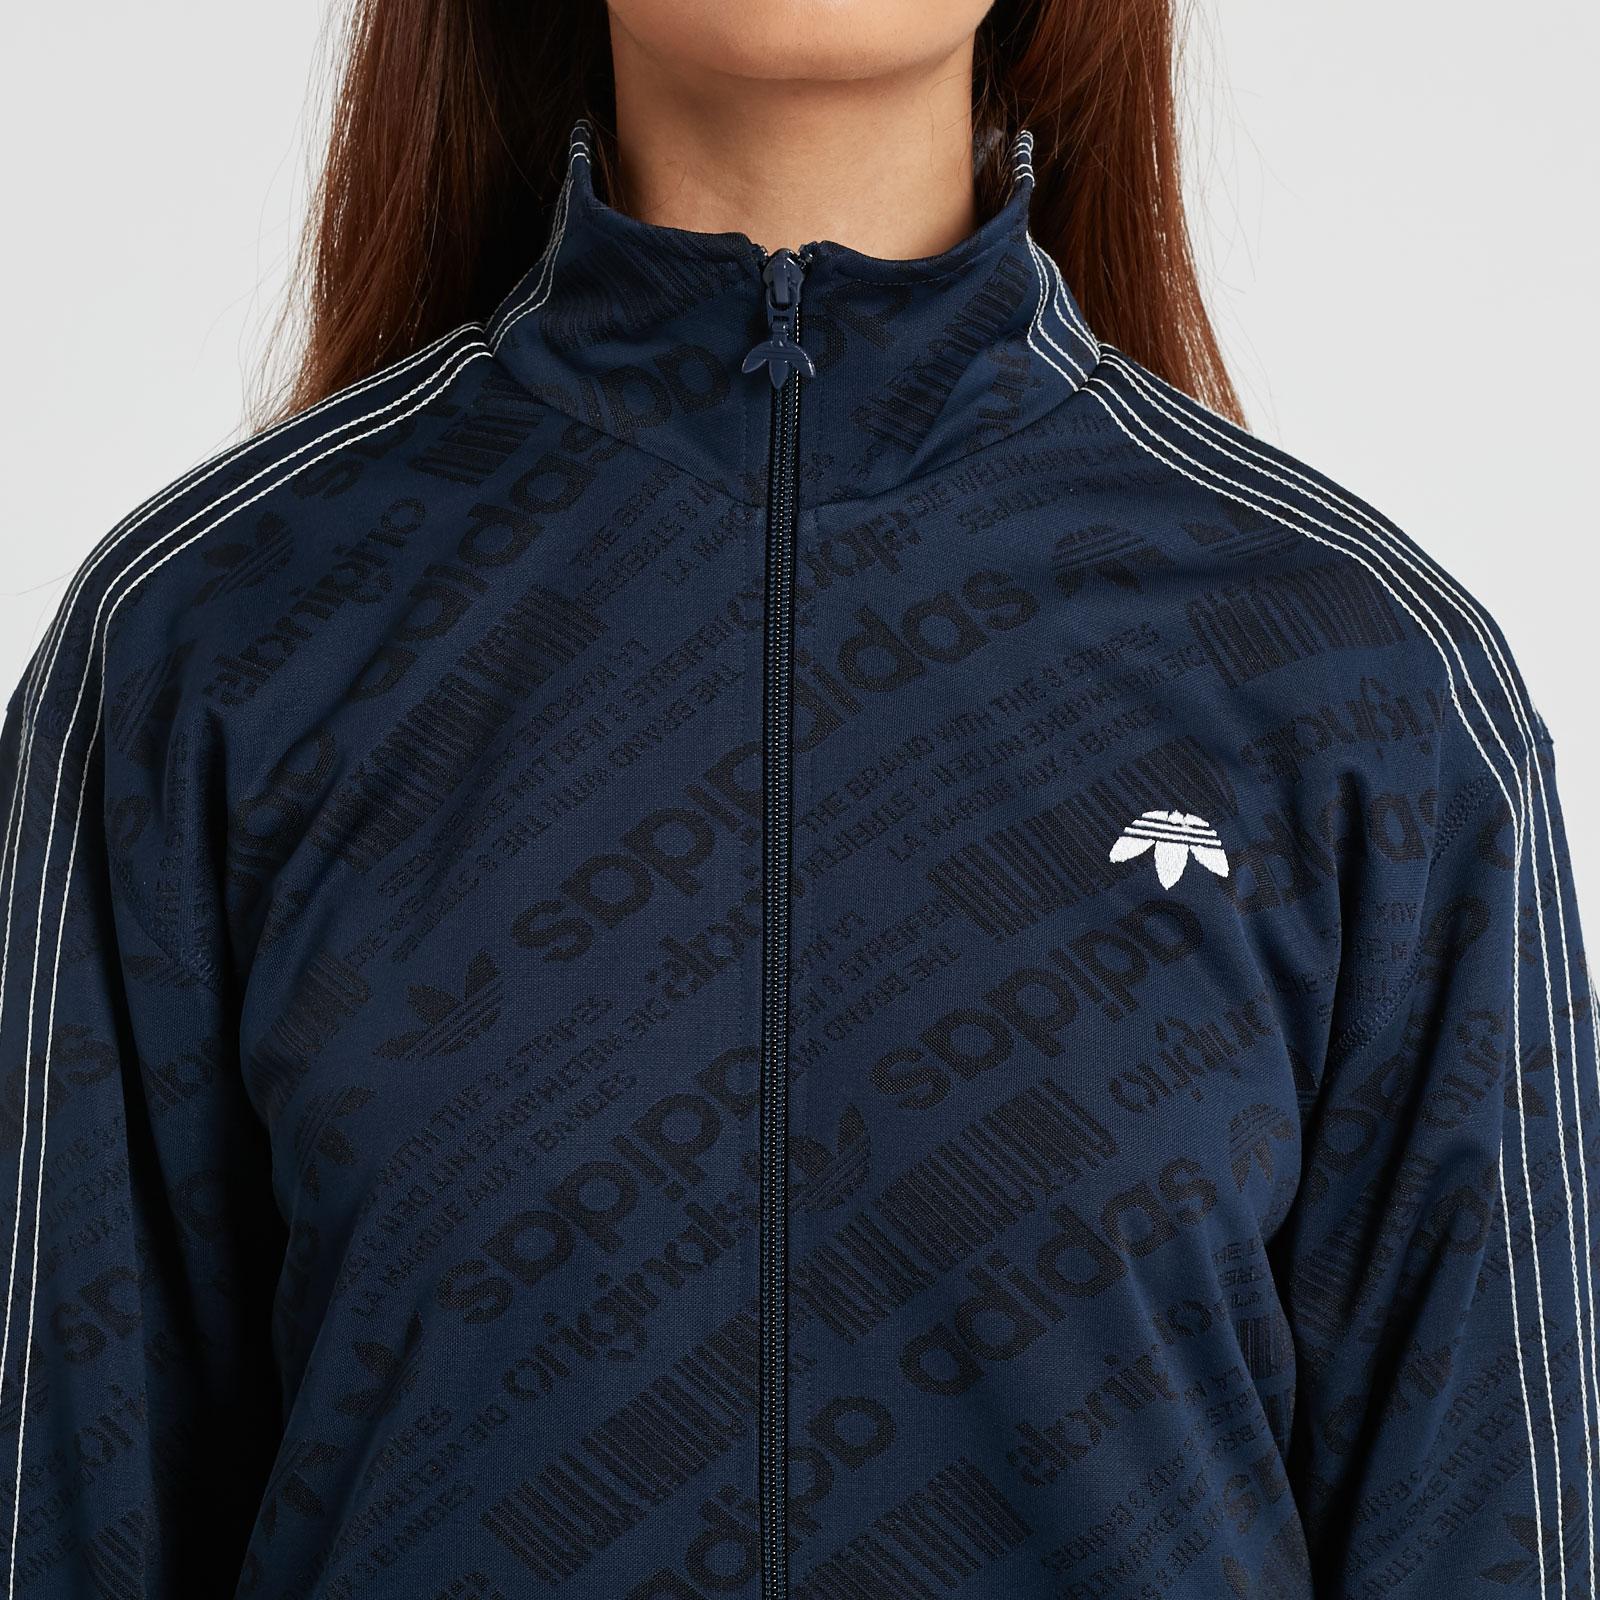 Cf1084 Jacket Jacquard Adidas Track SneakersnstuffSneakers Ow0Pnk